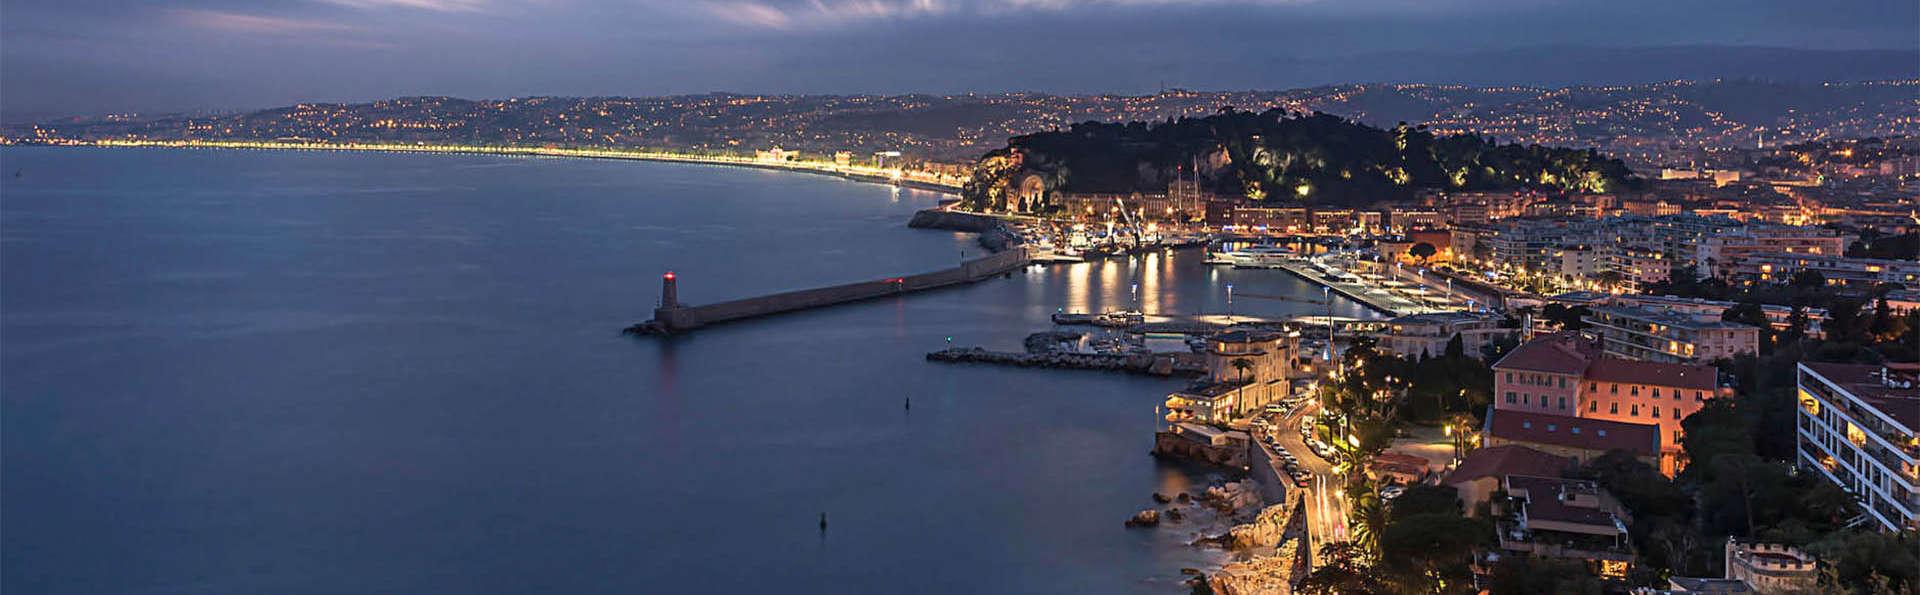 Hôtel Esprit d'Azur - EDIT_AERIAL_01.jpg